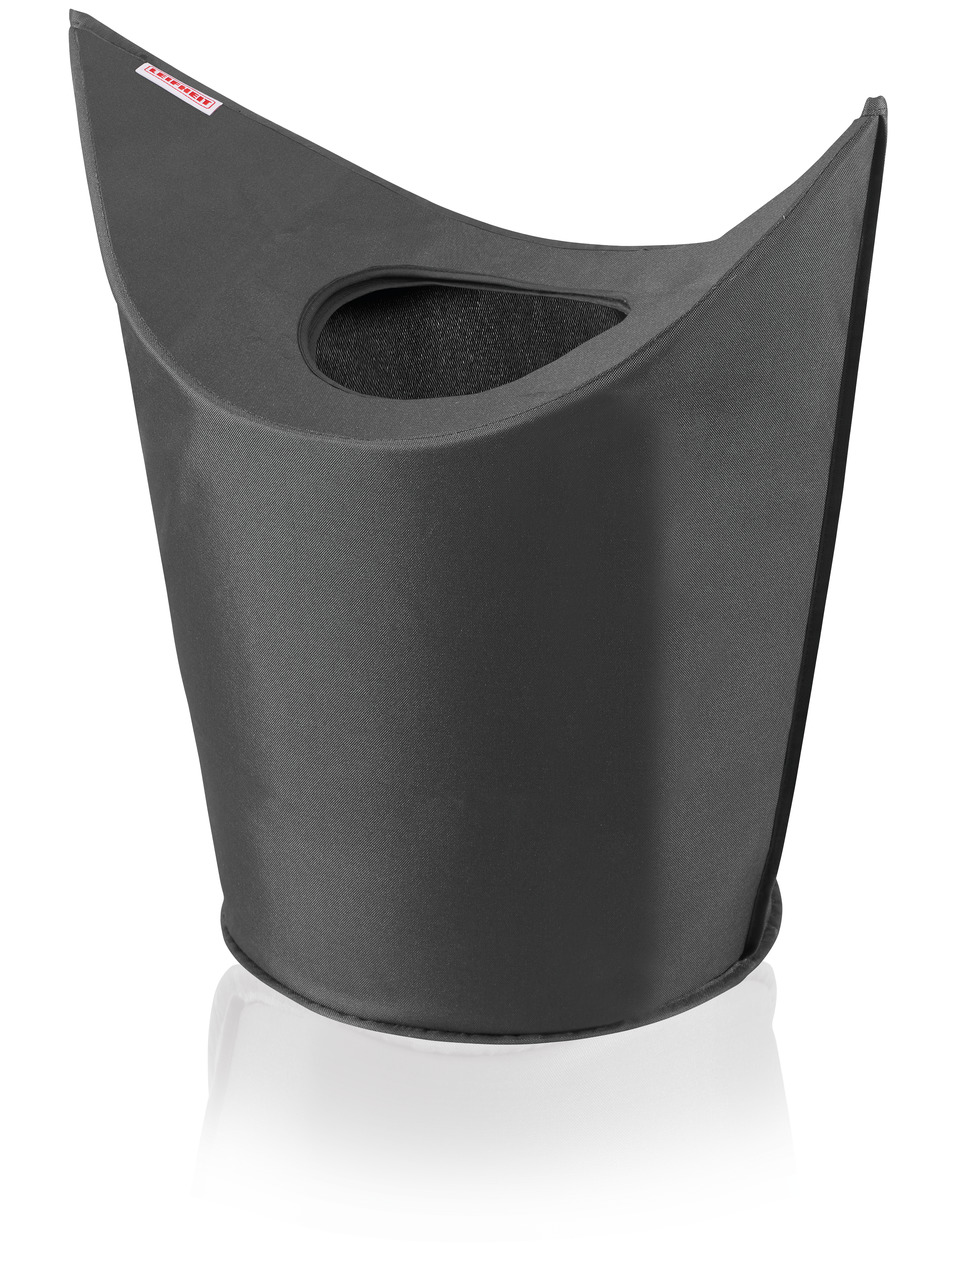 LEIFHEIT 80021 Laundry Bag black